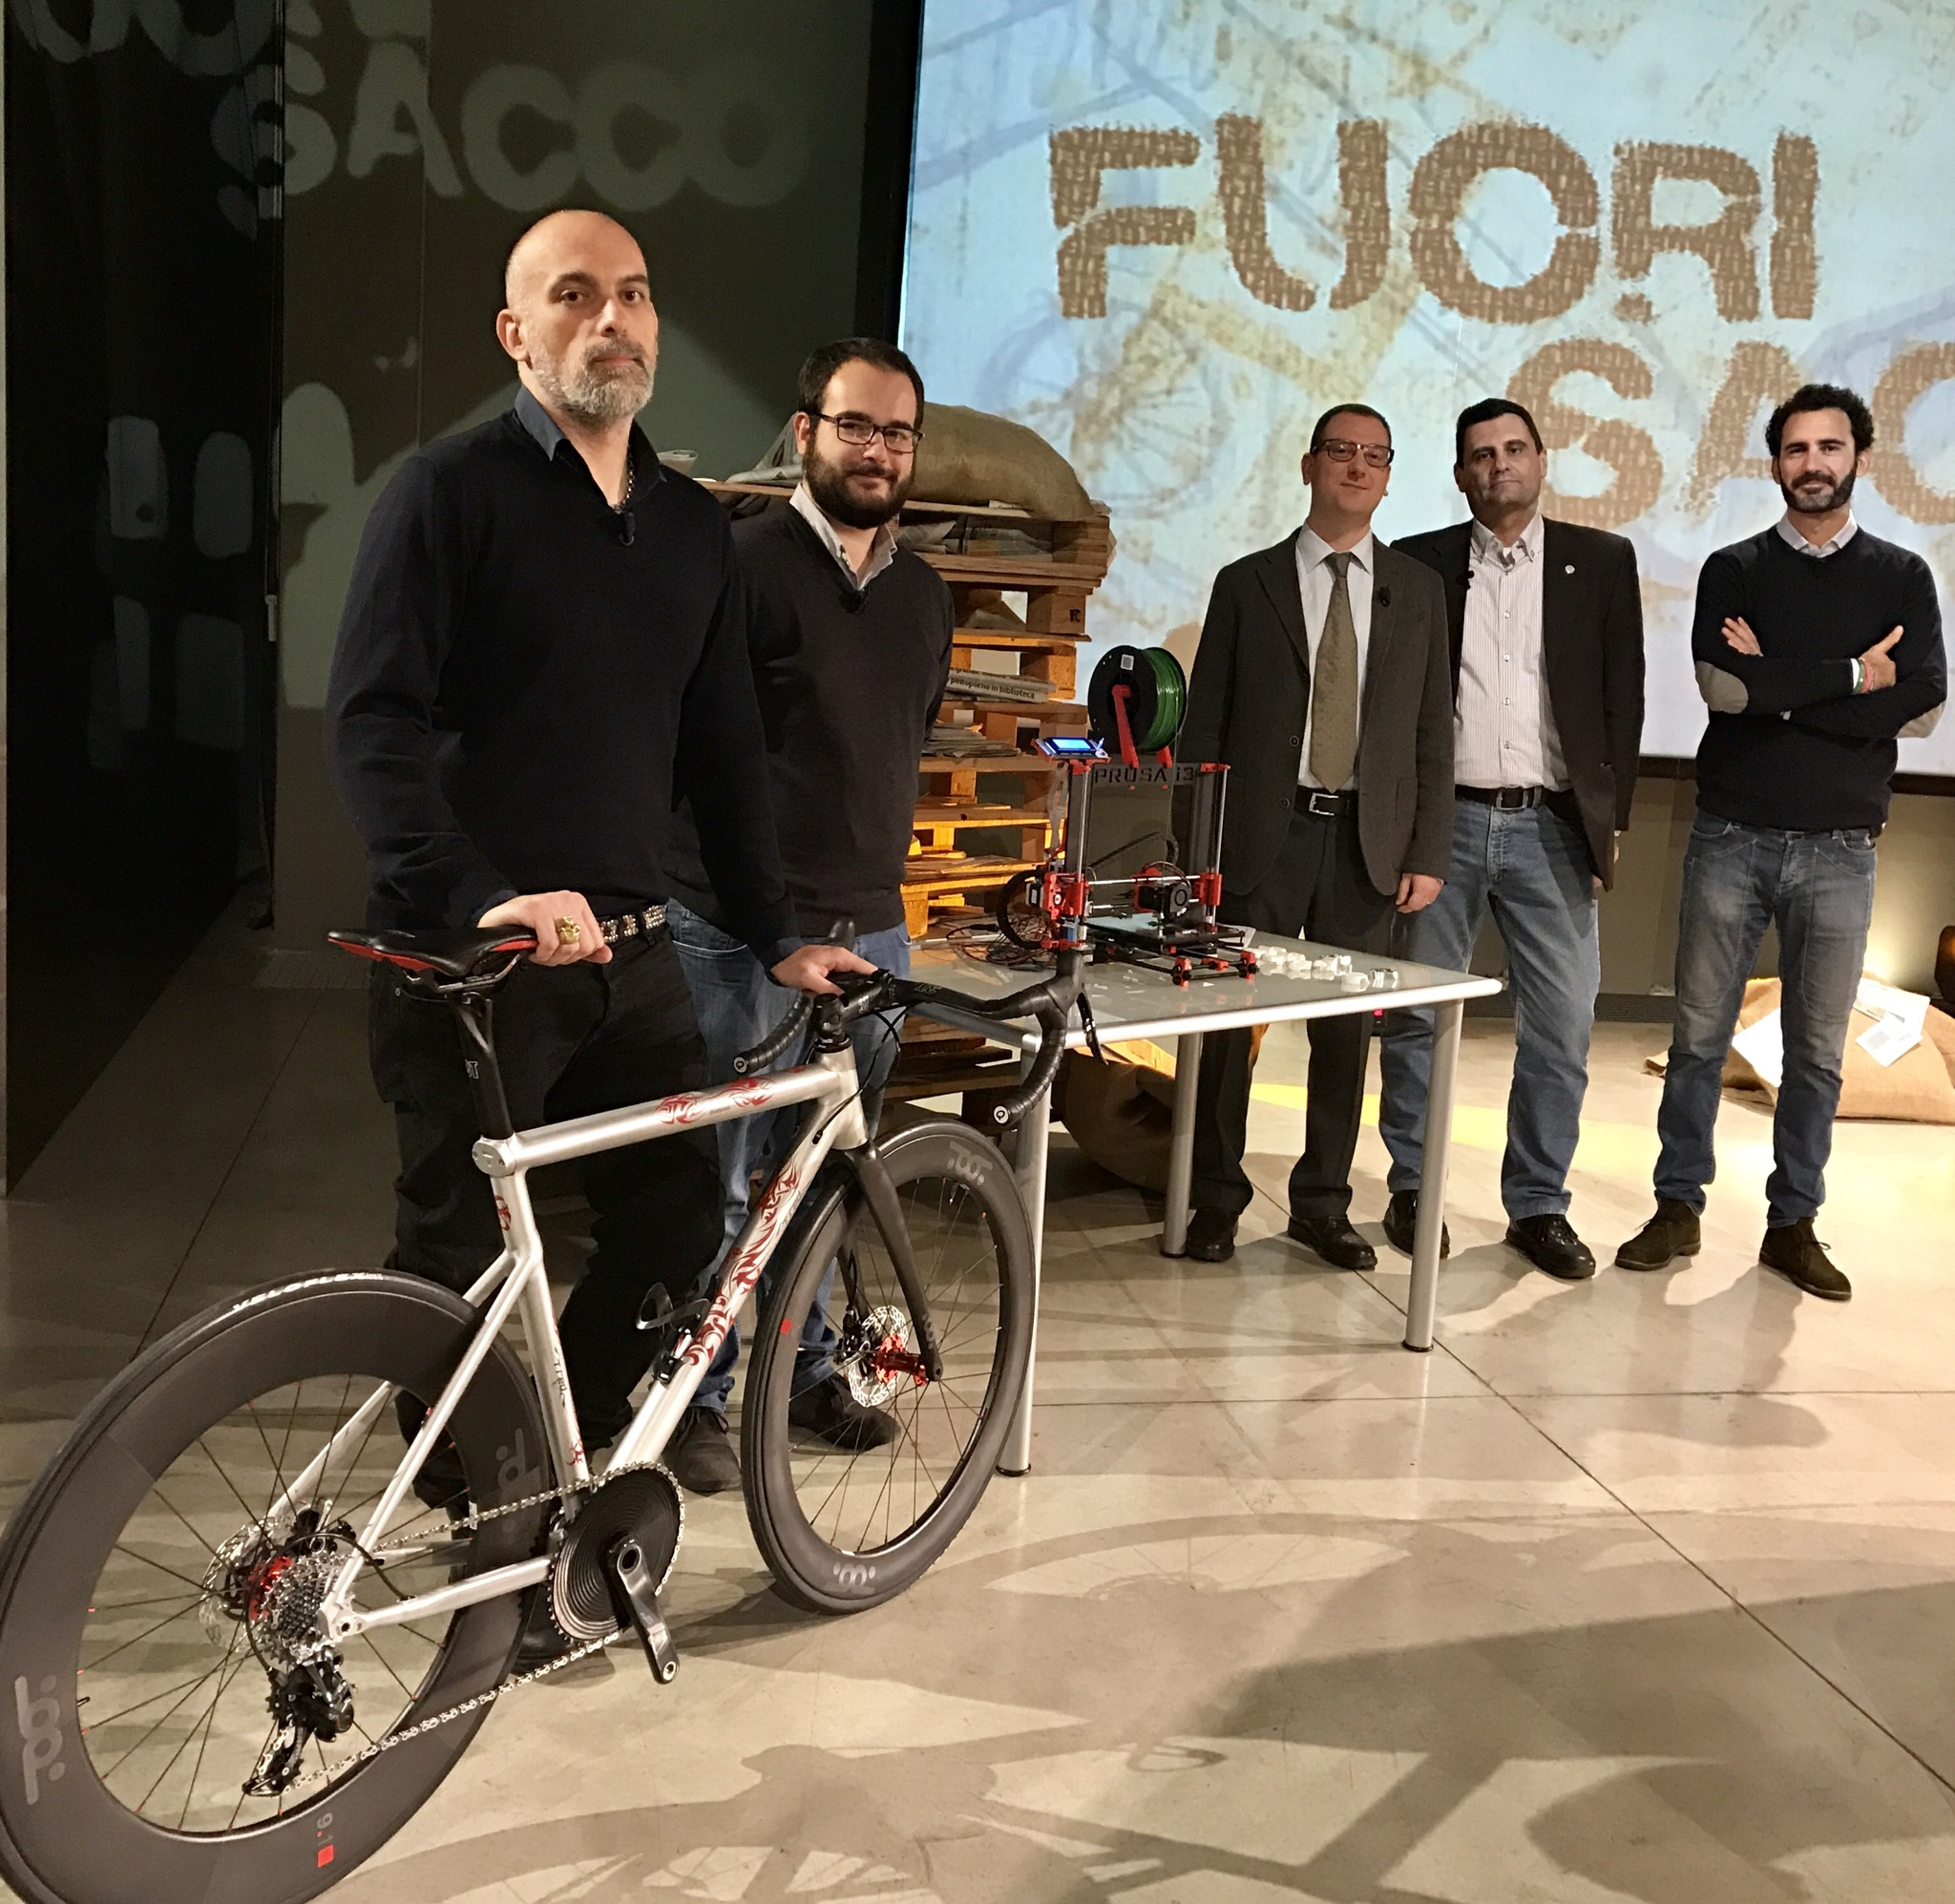 Urban Hub, in sette mesi valutate ben 200 idee imprenditoriali